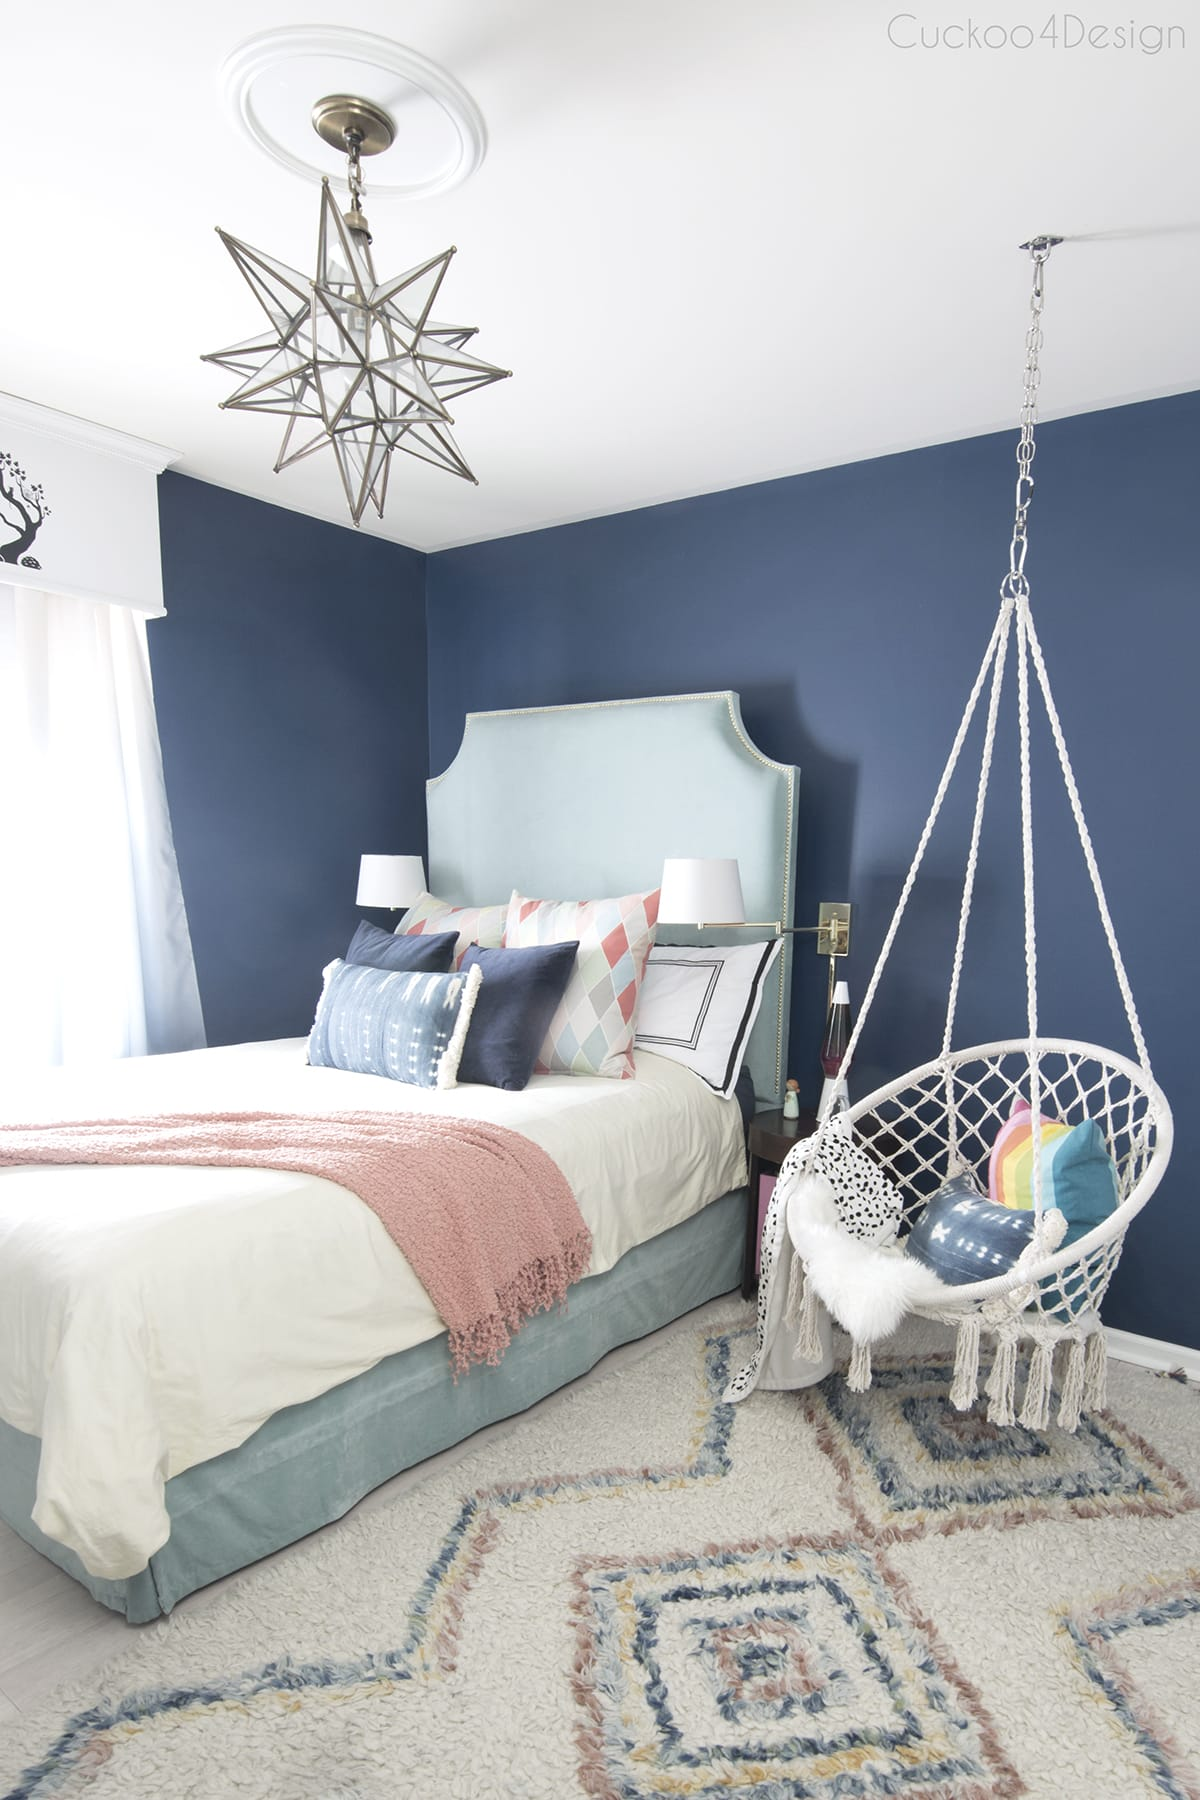 Dark Blue Girls Room | Cuckoo4Design on Room Girl  id=99999